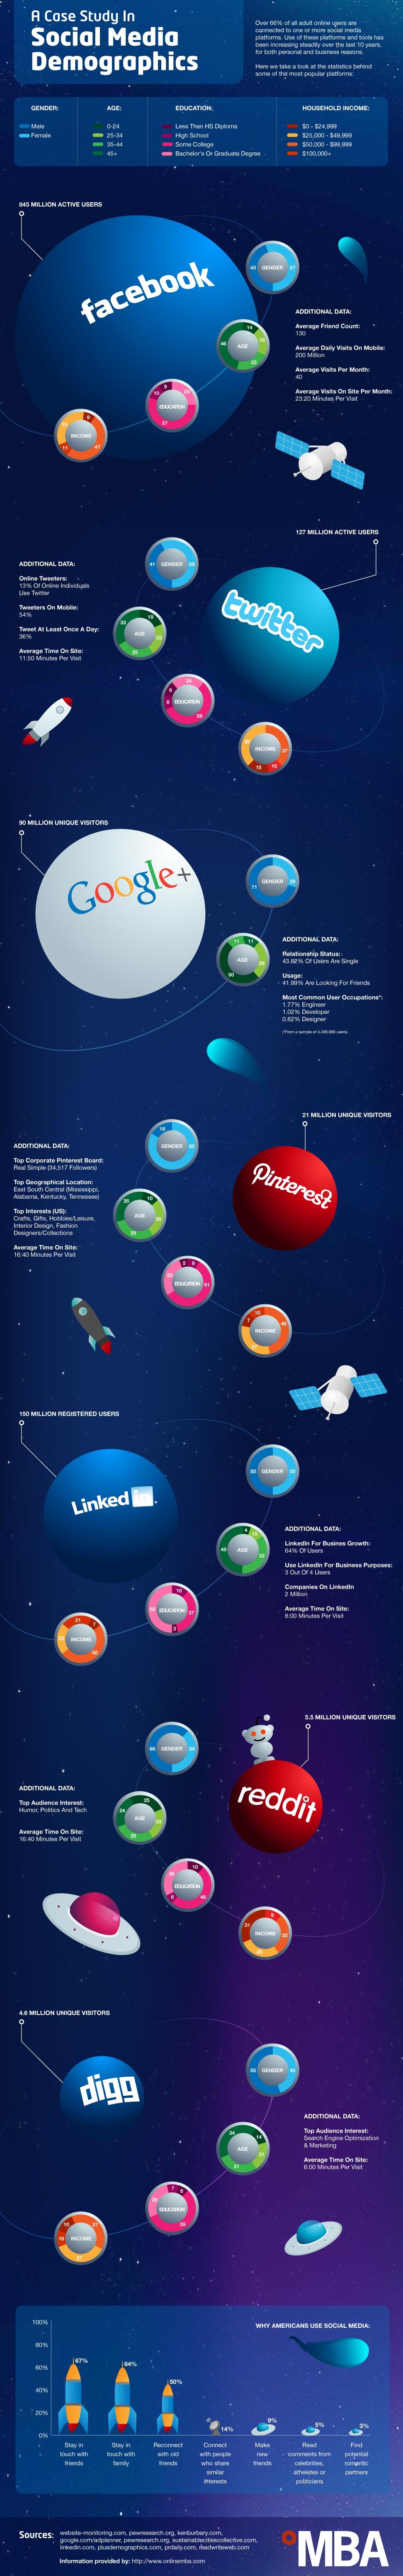 Social Media Users Interest social media,case study,interest,demographic,infographic